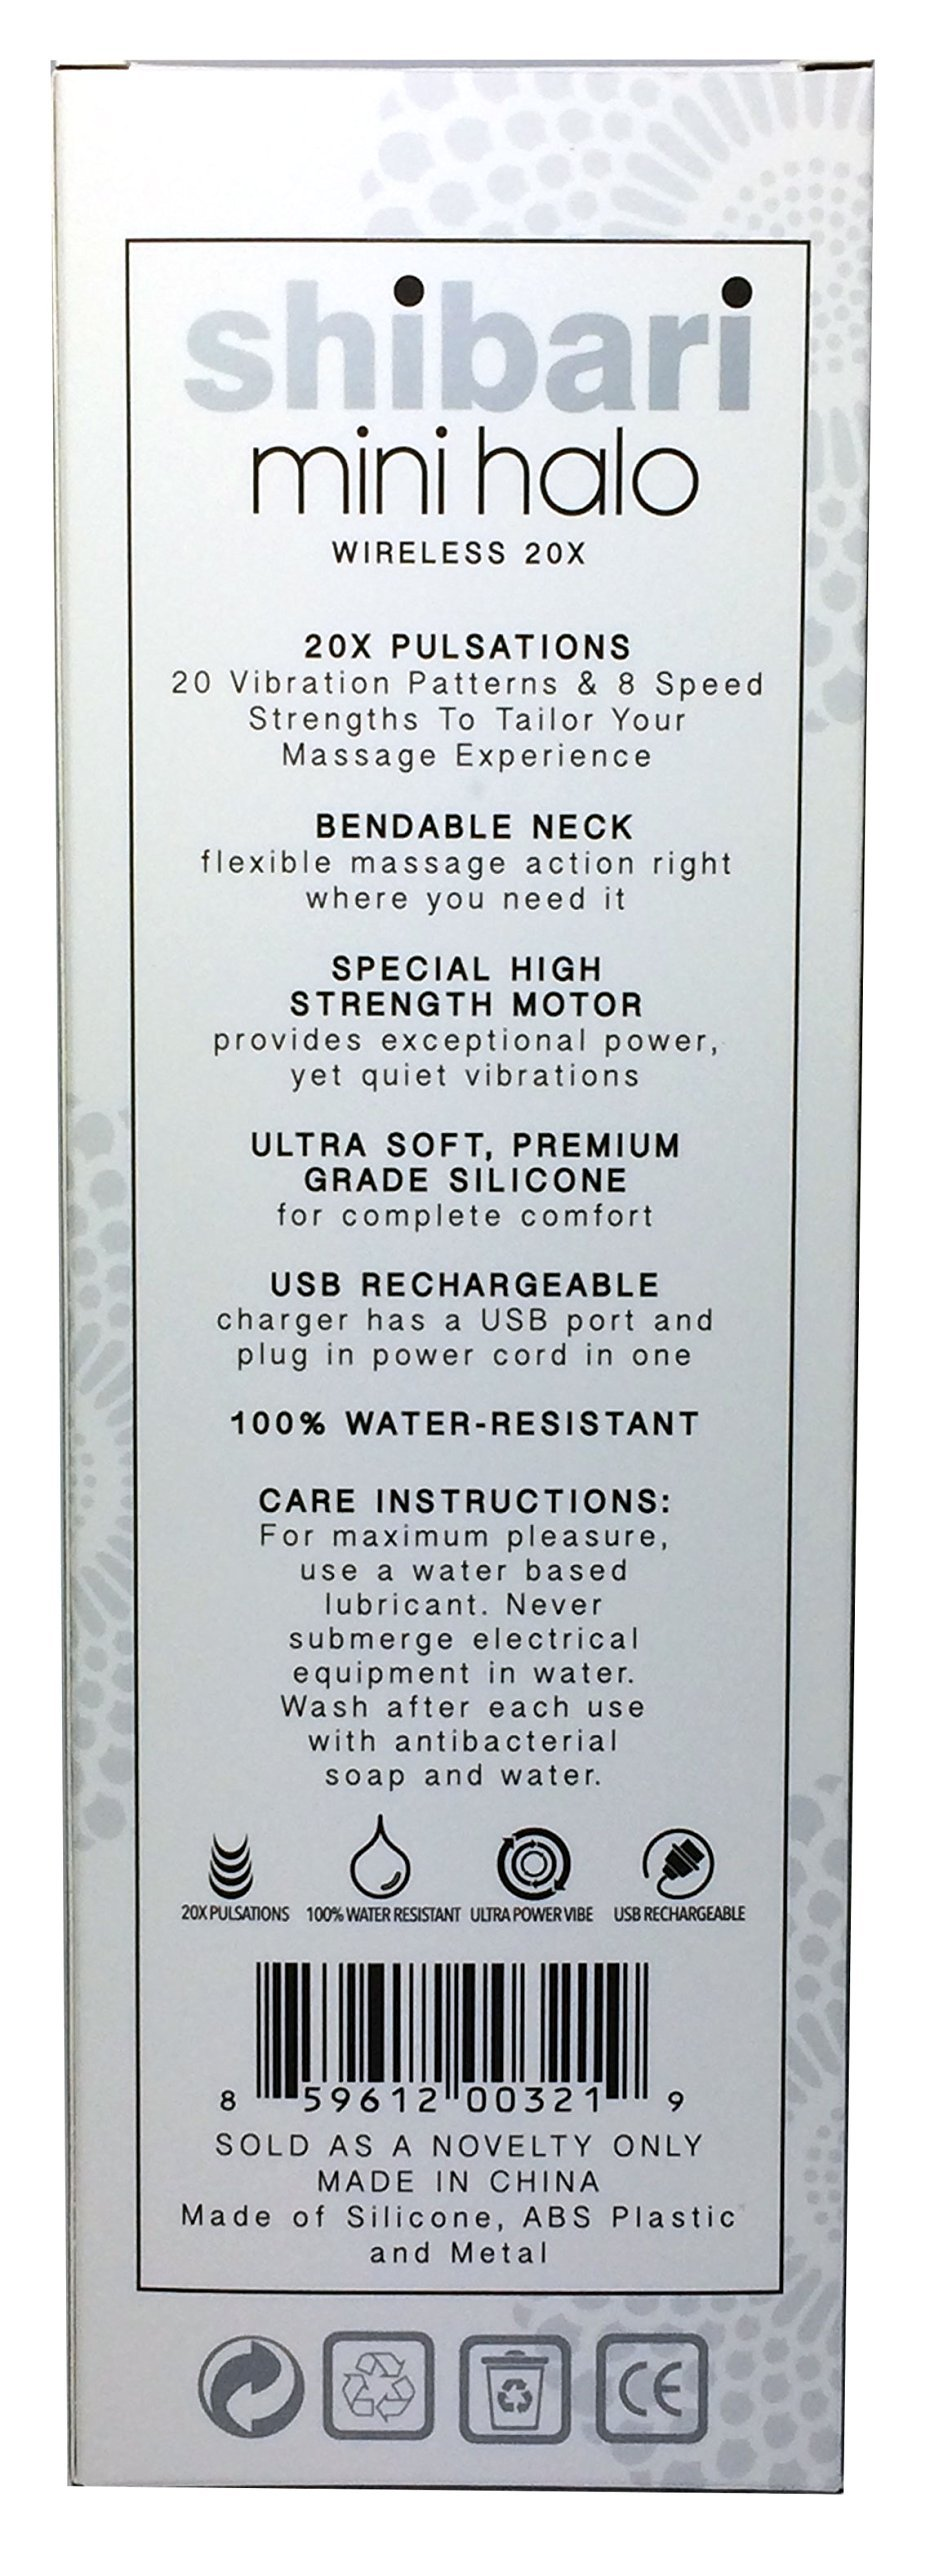 Shibari Mini Halo,''The Original'' Compact Power Wand Massager, Wireless, 20x Multi-speed Vibrations (Black)